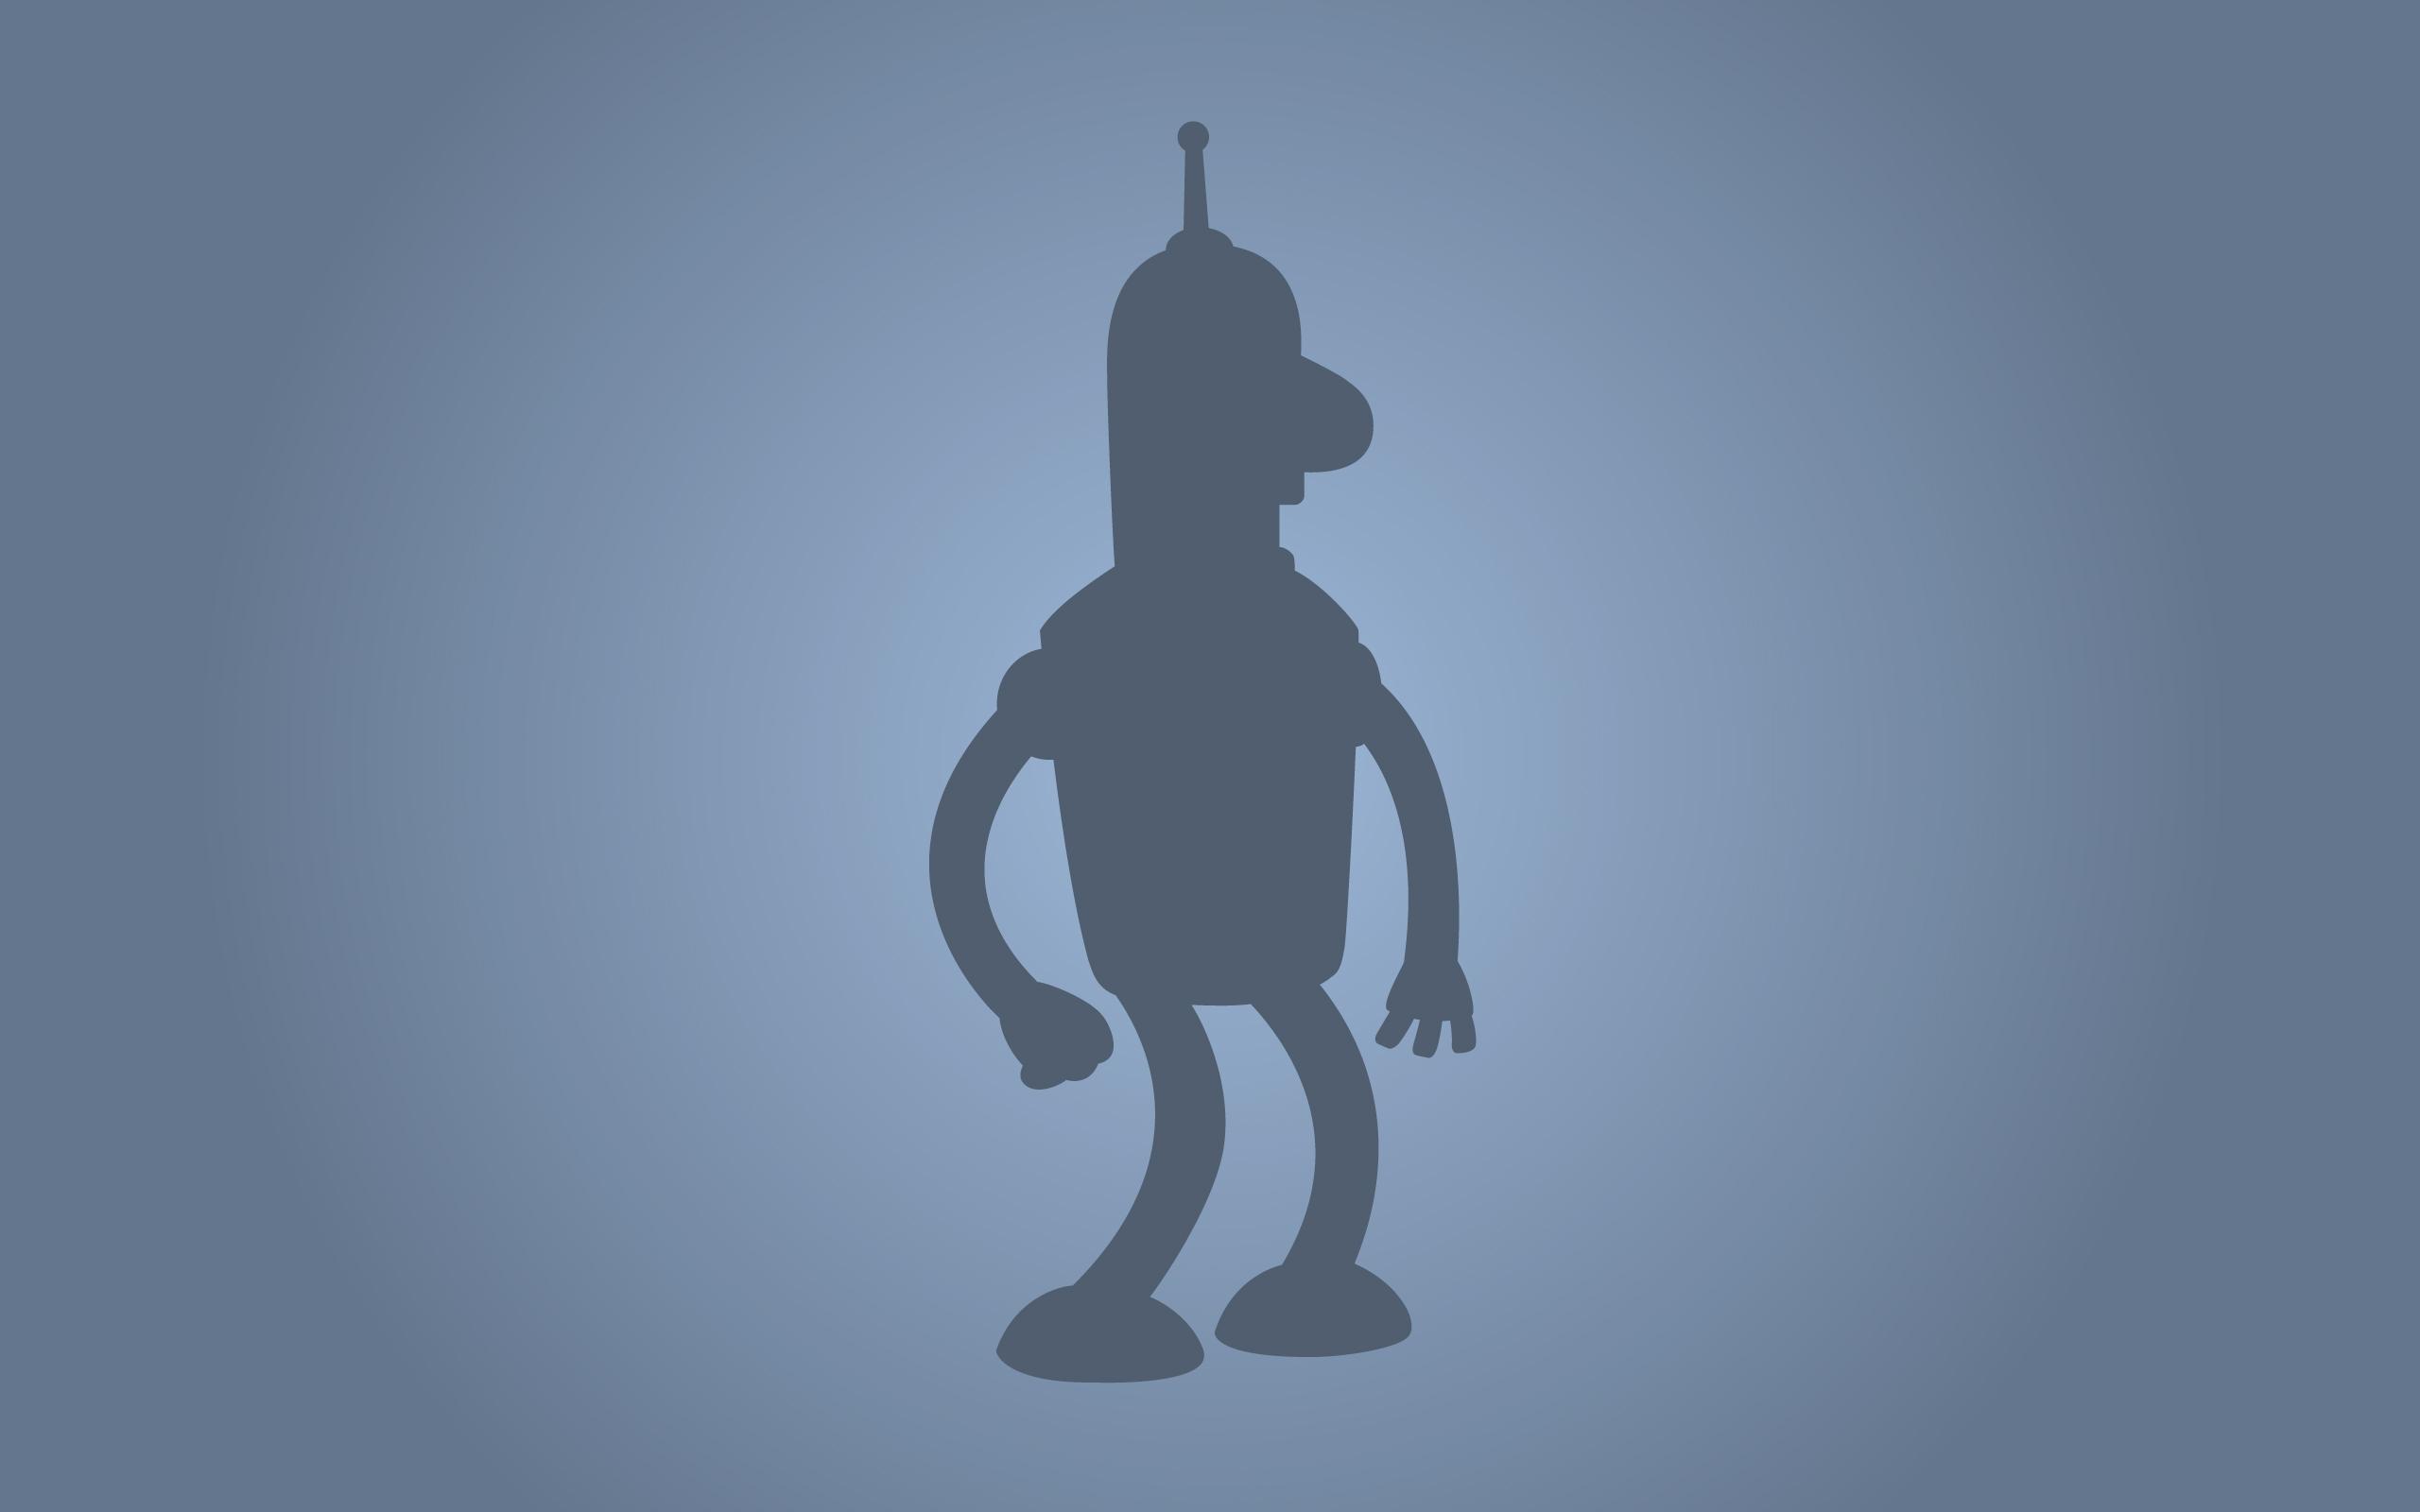 Bender - Futurama wallpaper | 2560x1600